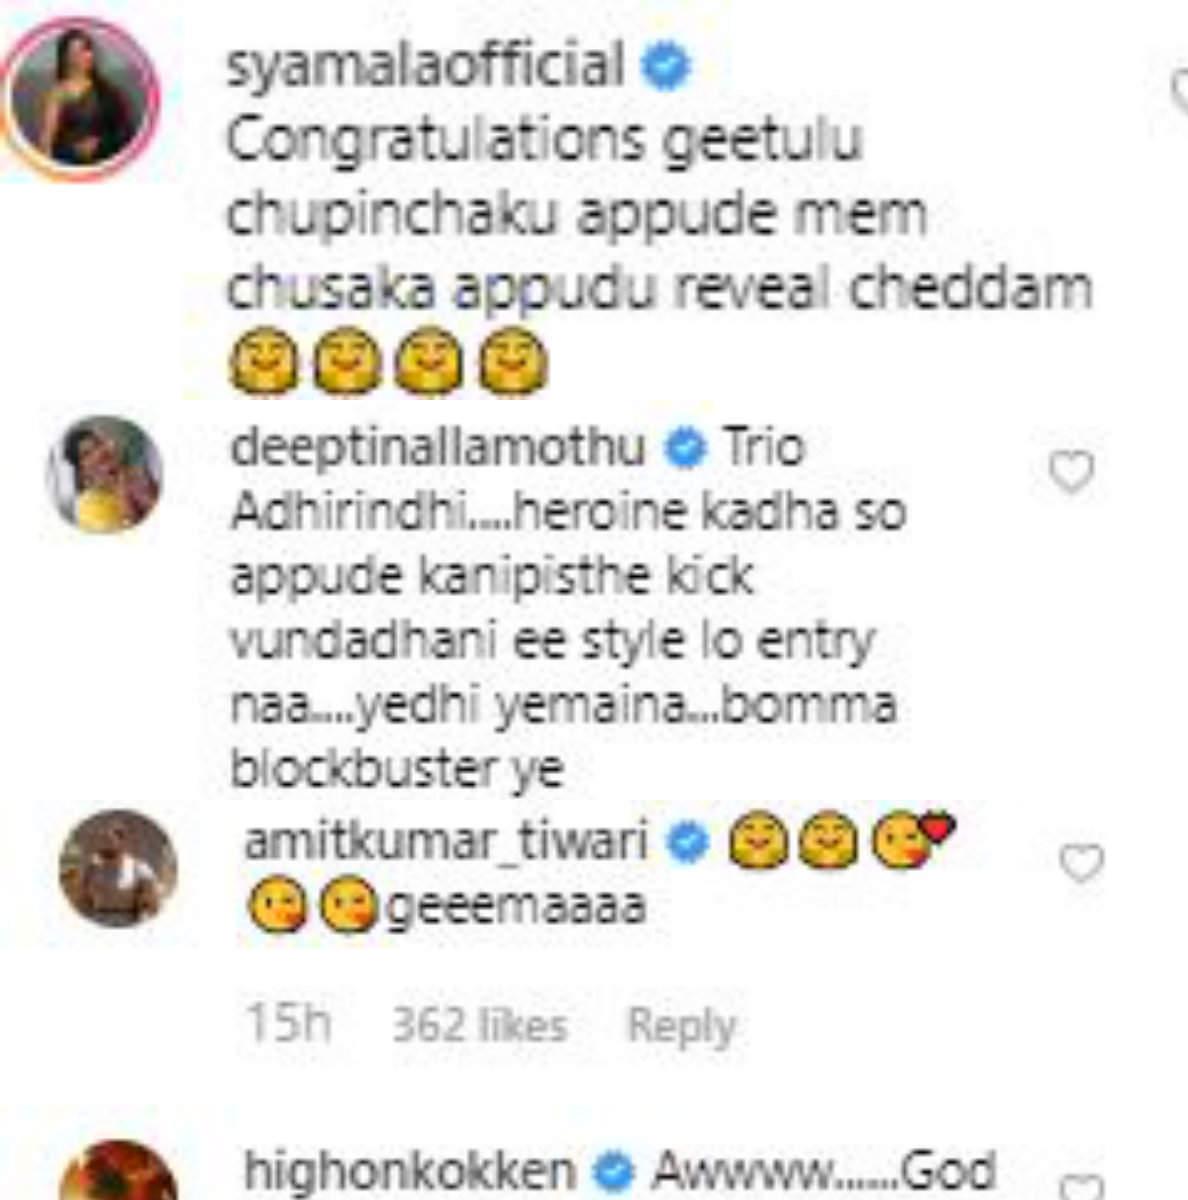 Bigg Boss BFFs wish Nandu and Geetha